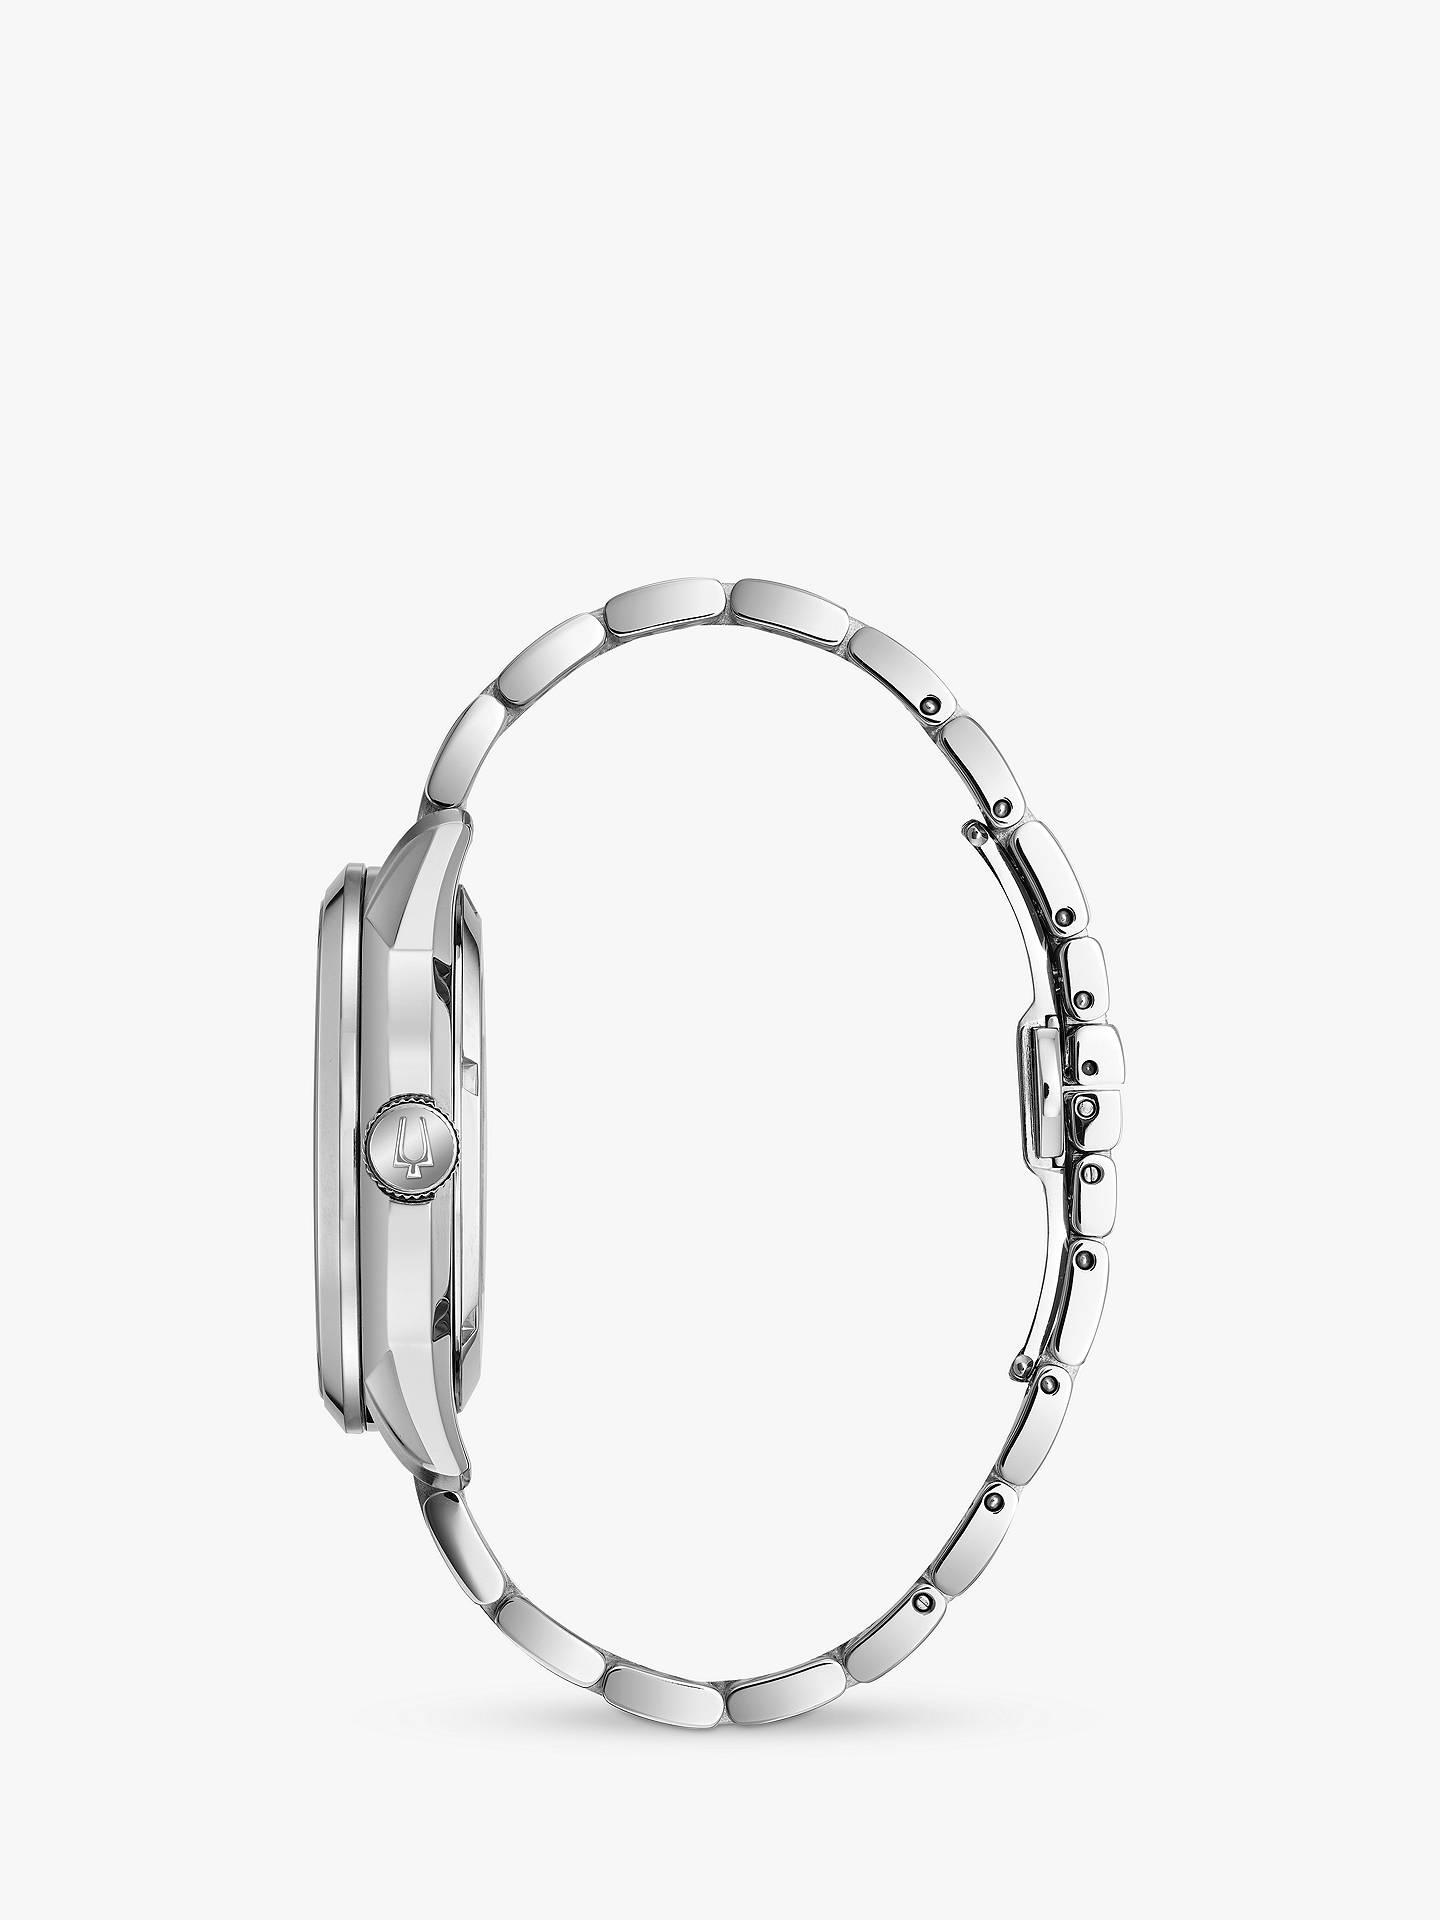 66fb6f010 ... Buy Bulova 96A208 Men's Sutton Skeleton Automatic Bracelet Strap Watch,  Silver/Black Online at ...